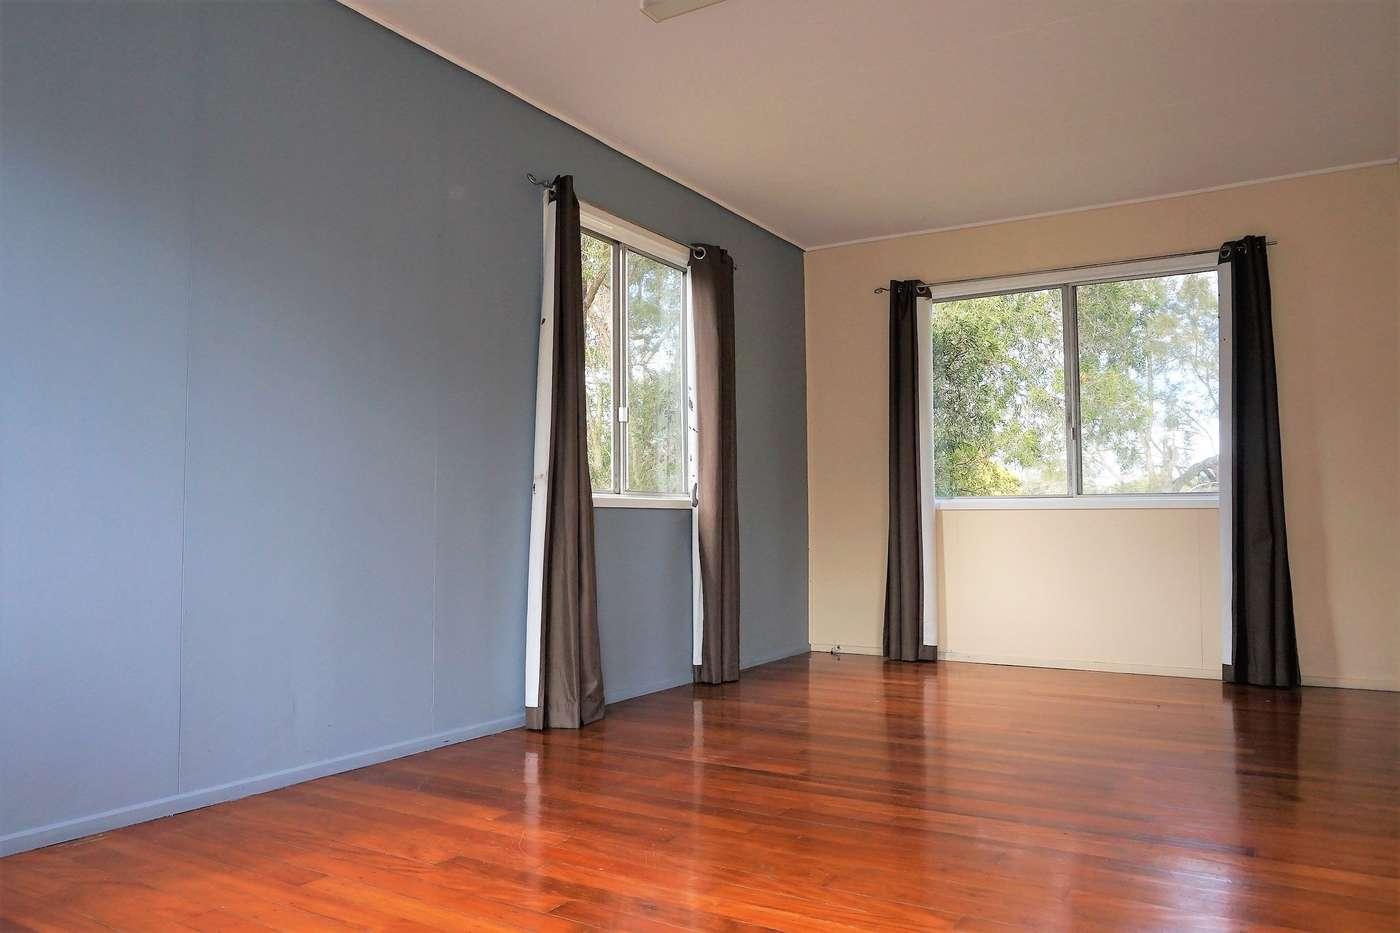 Main view of Homely house listing, 26 Ash Avenue, Woodridge, QLD 4114